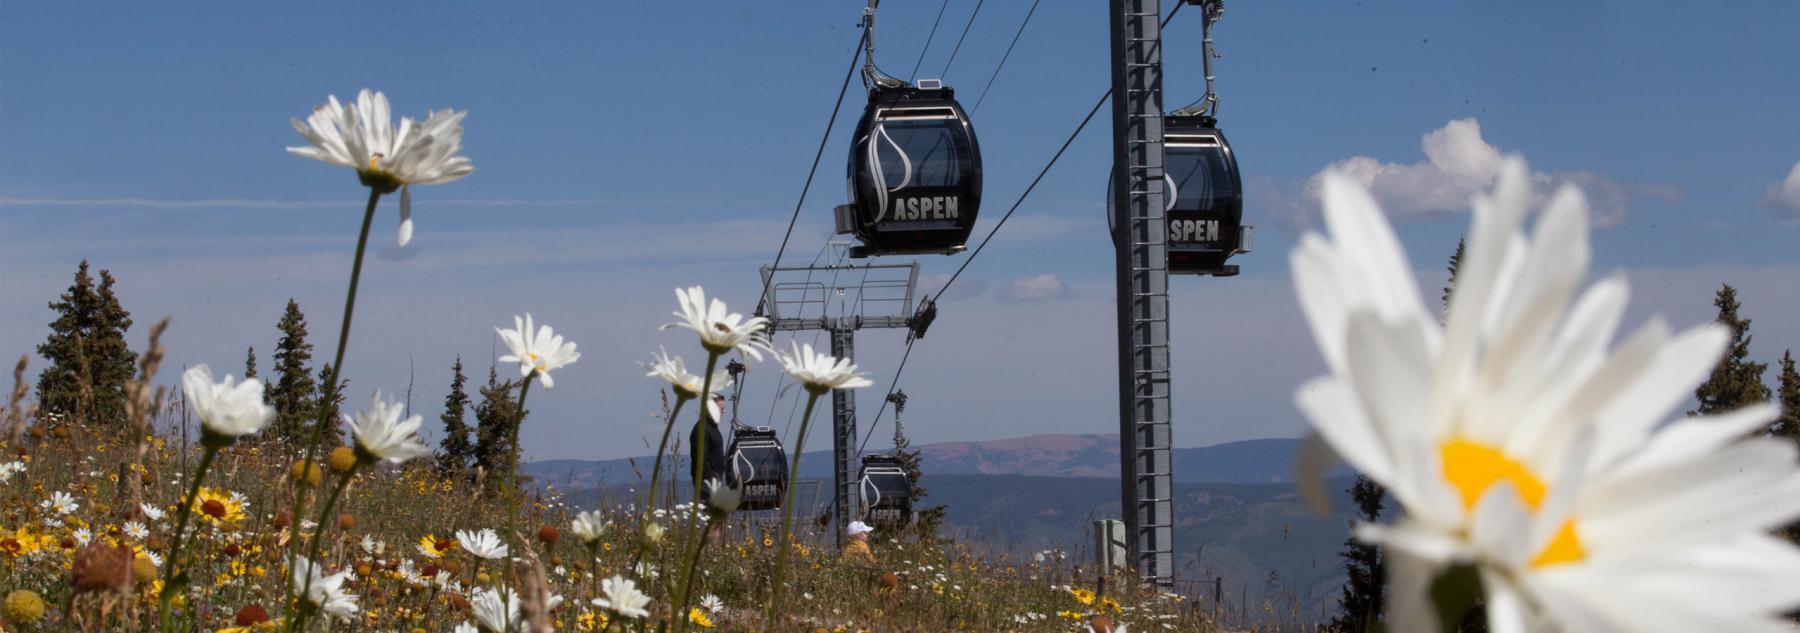 Aspen Mountain Gondola During Summer